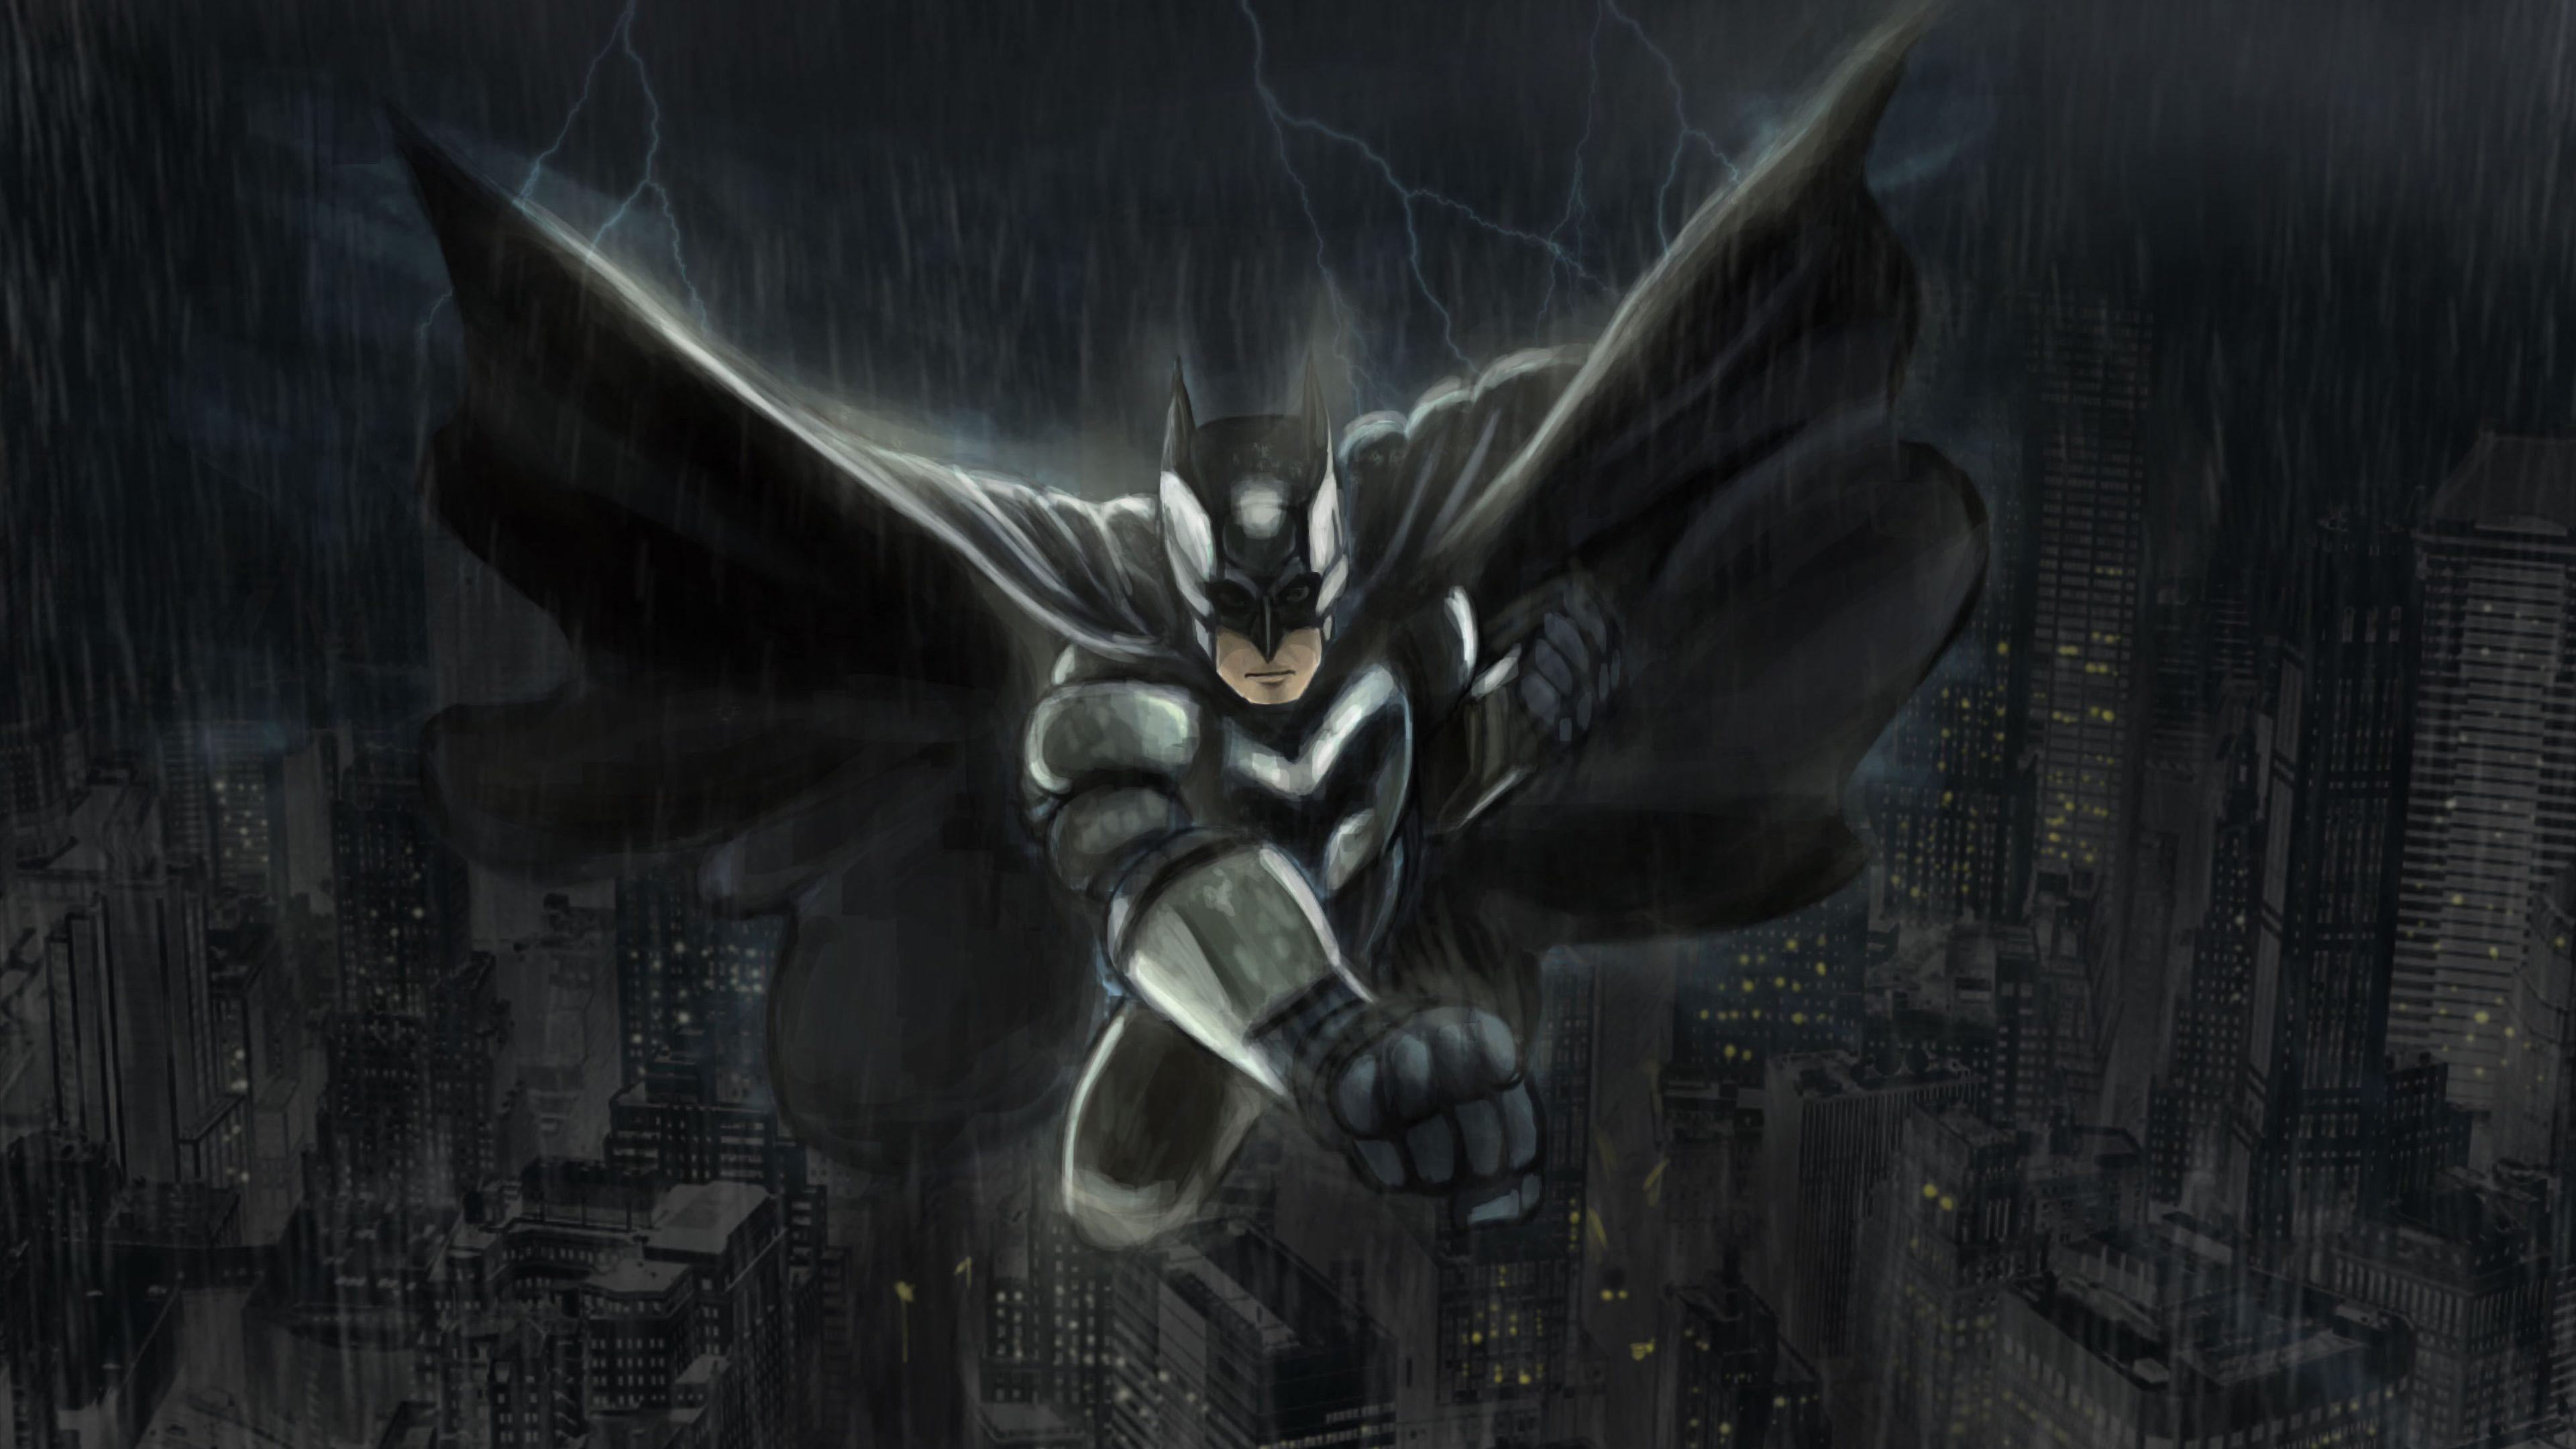 Anime Batman Black Monochrome 4k Wallpaper Best Wallpapers